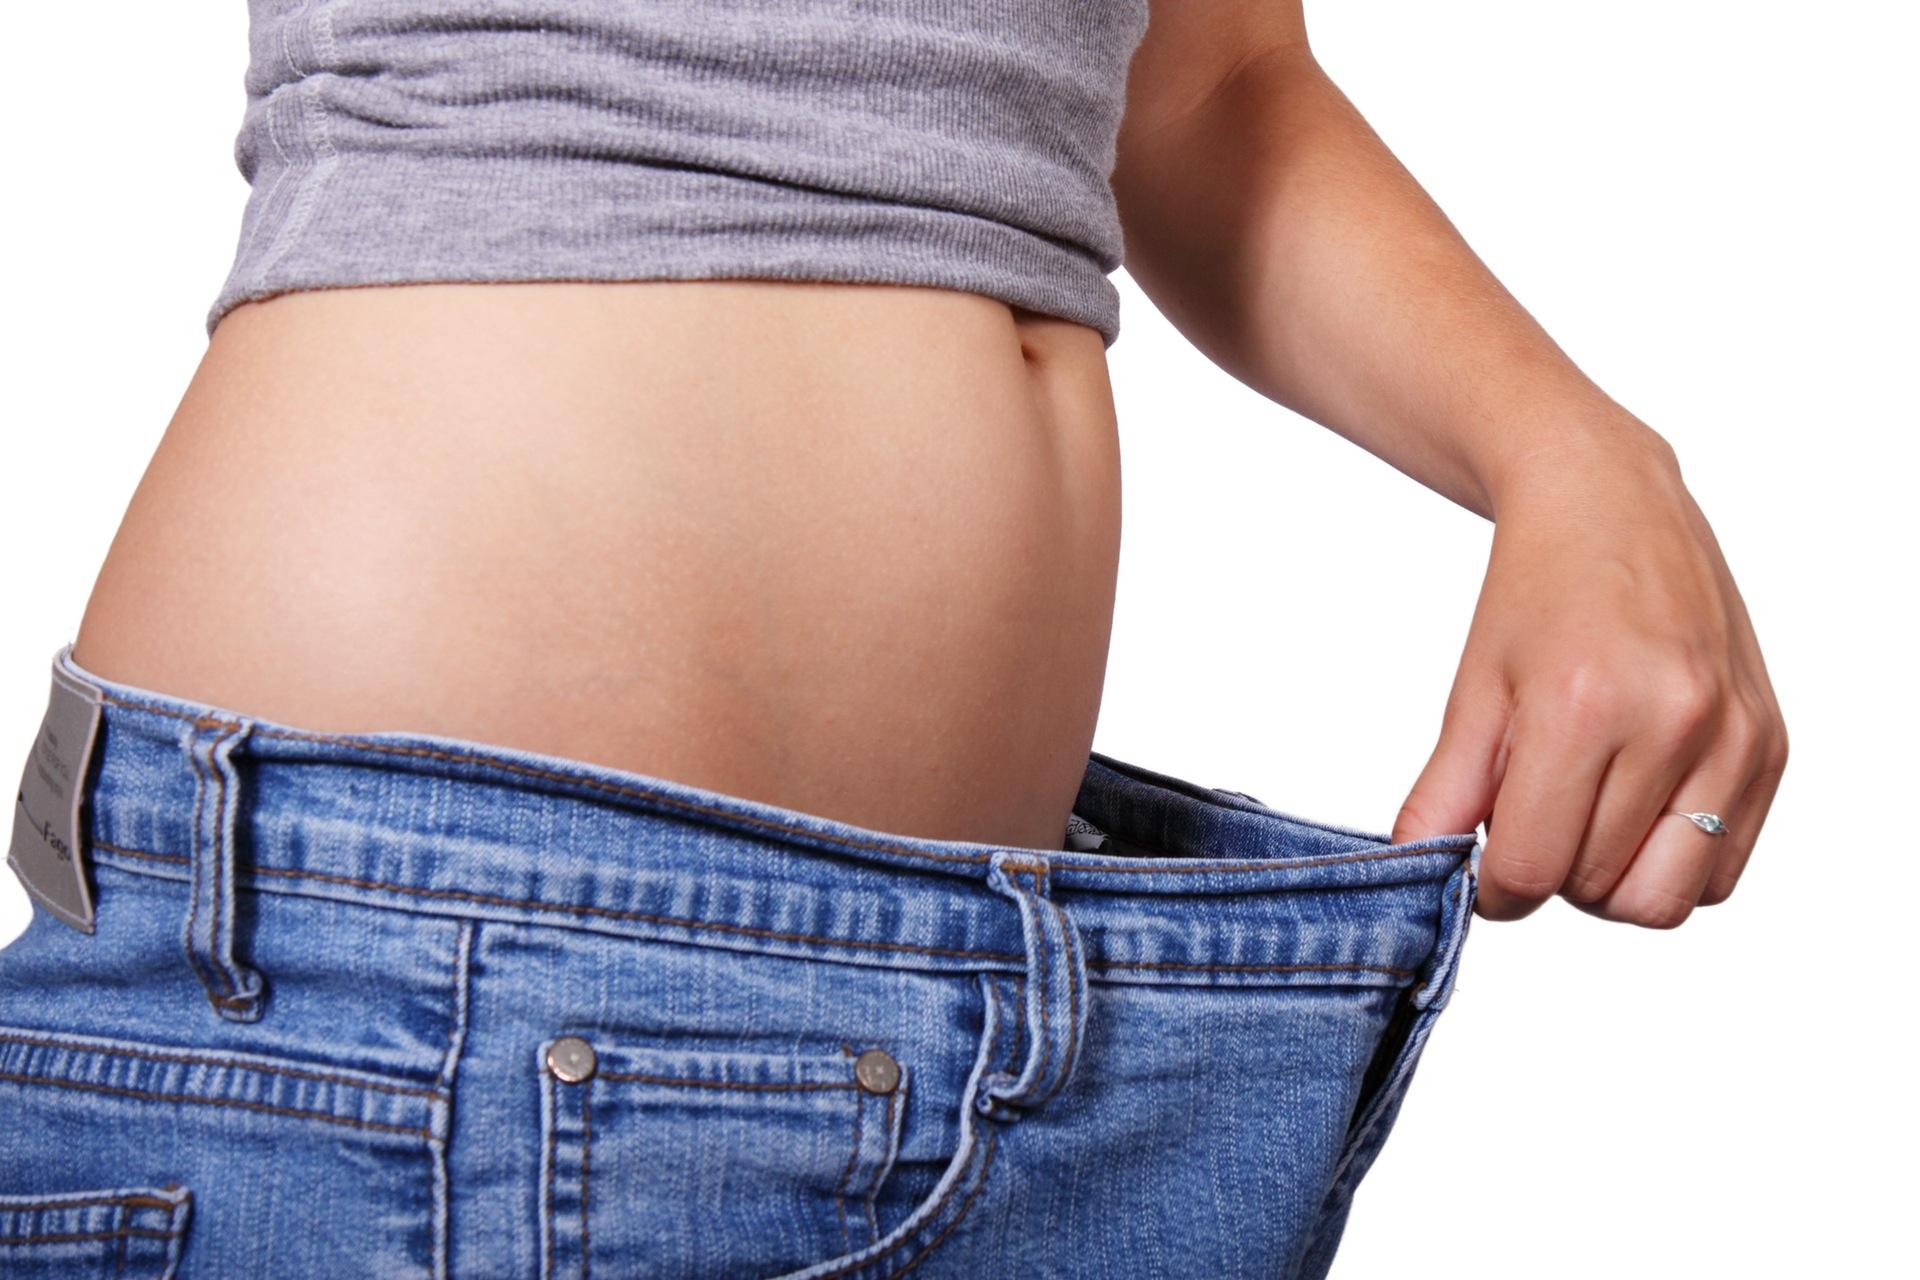 pierdere în greutate dr lagrange ga medela slimming nursing tank